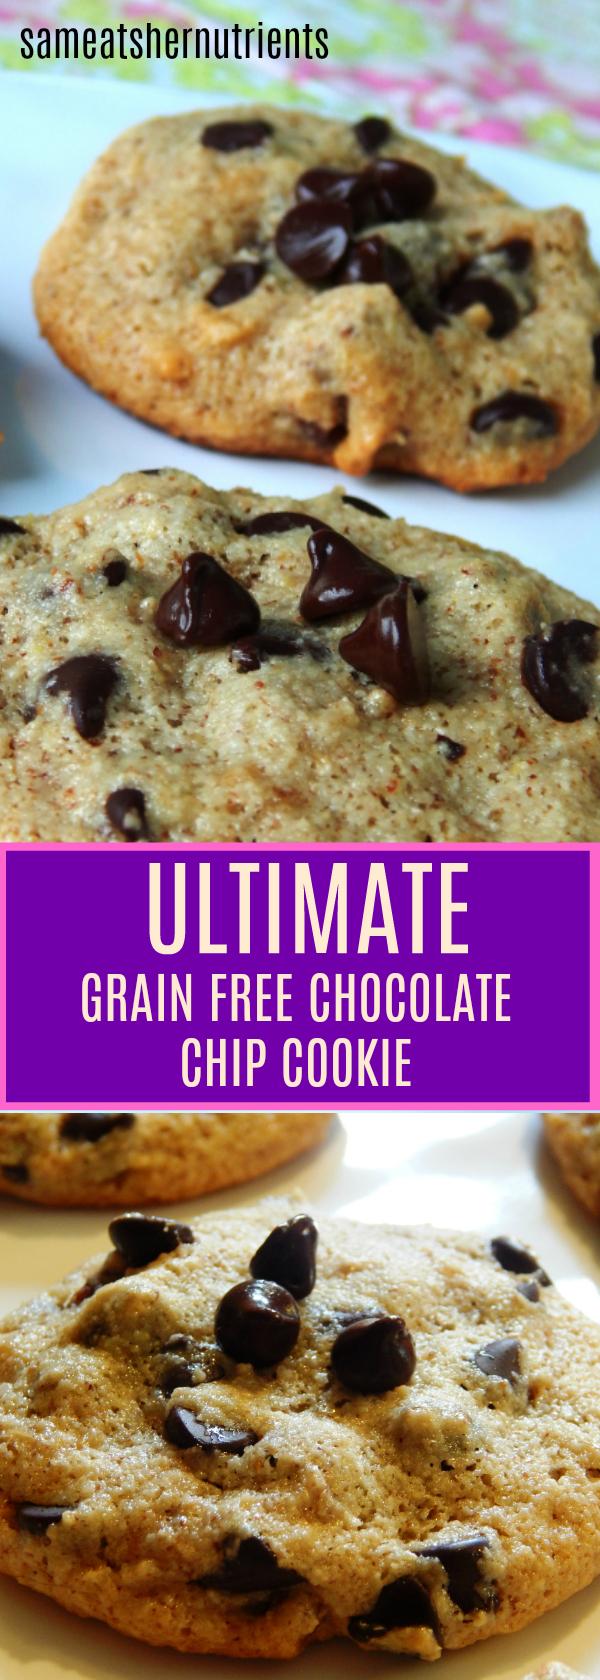 The Ultimate Grain Free Chocolate Chip Cookie - Grain Free, Paleo